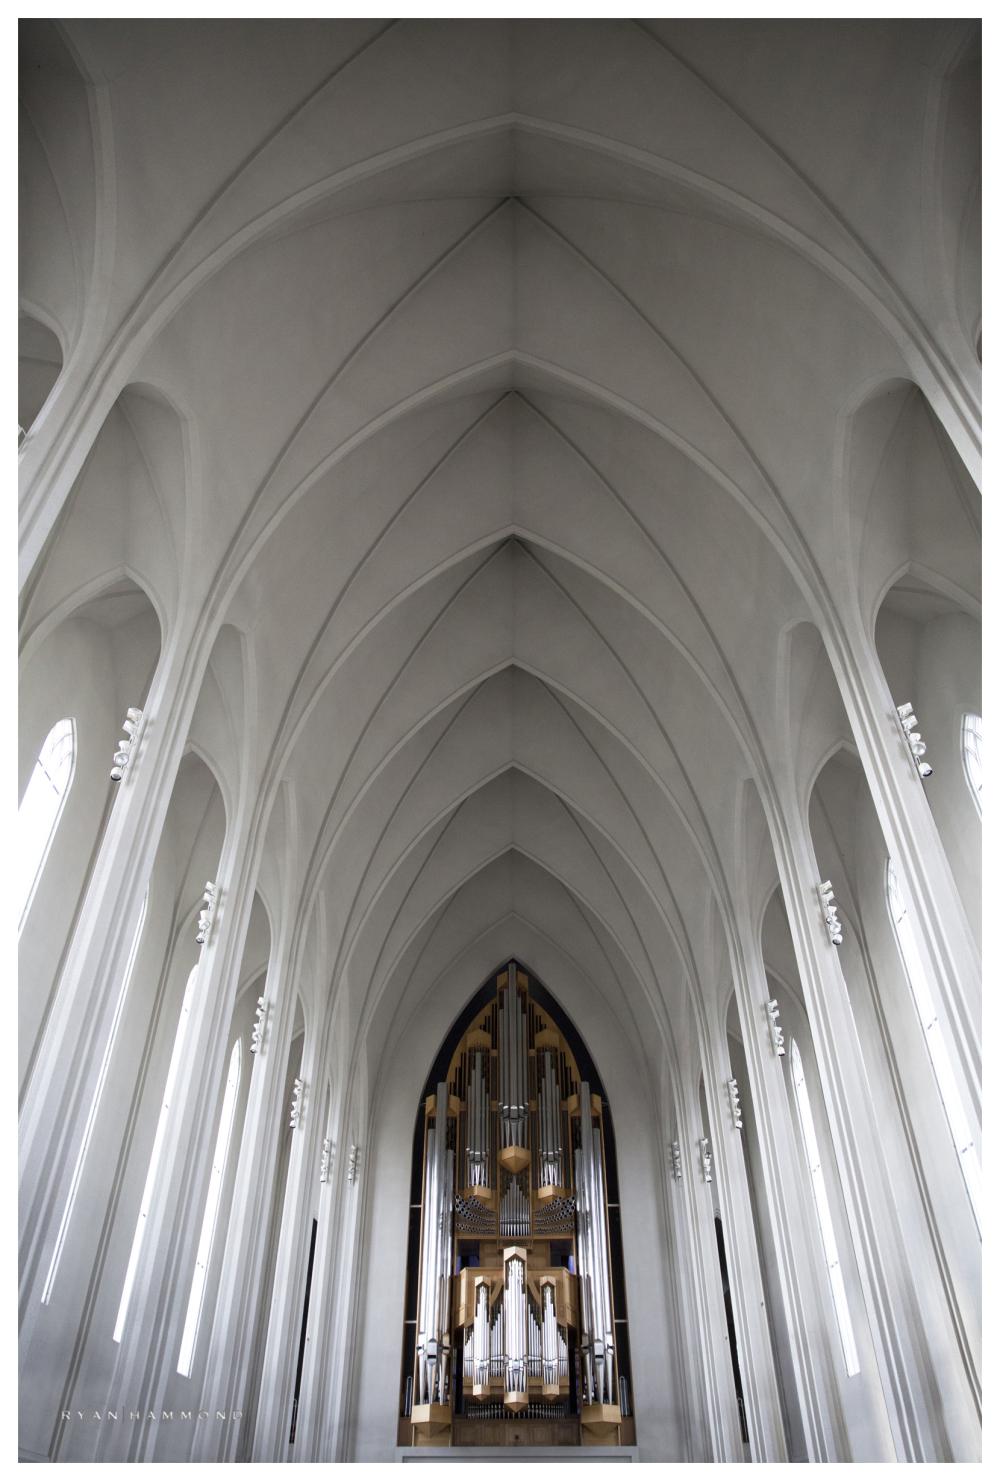 Hallgrimskirkja, Iceland, church, architecture